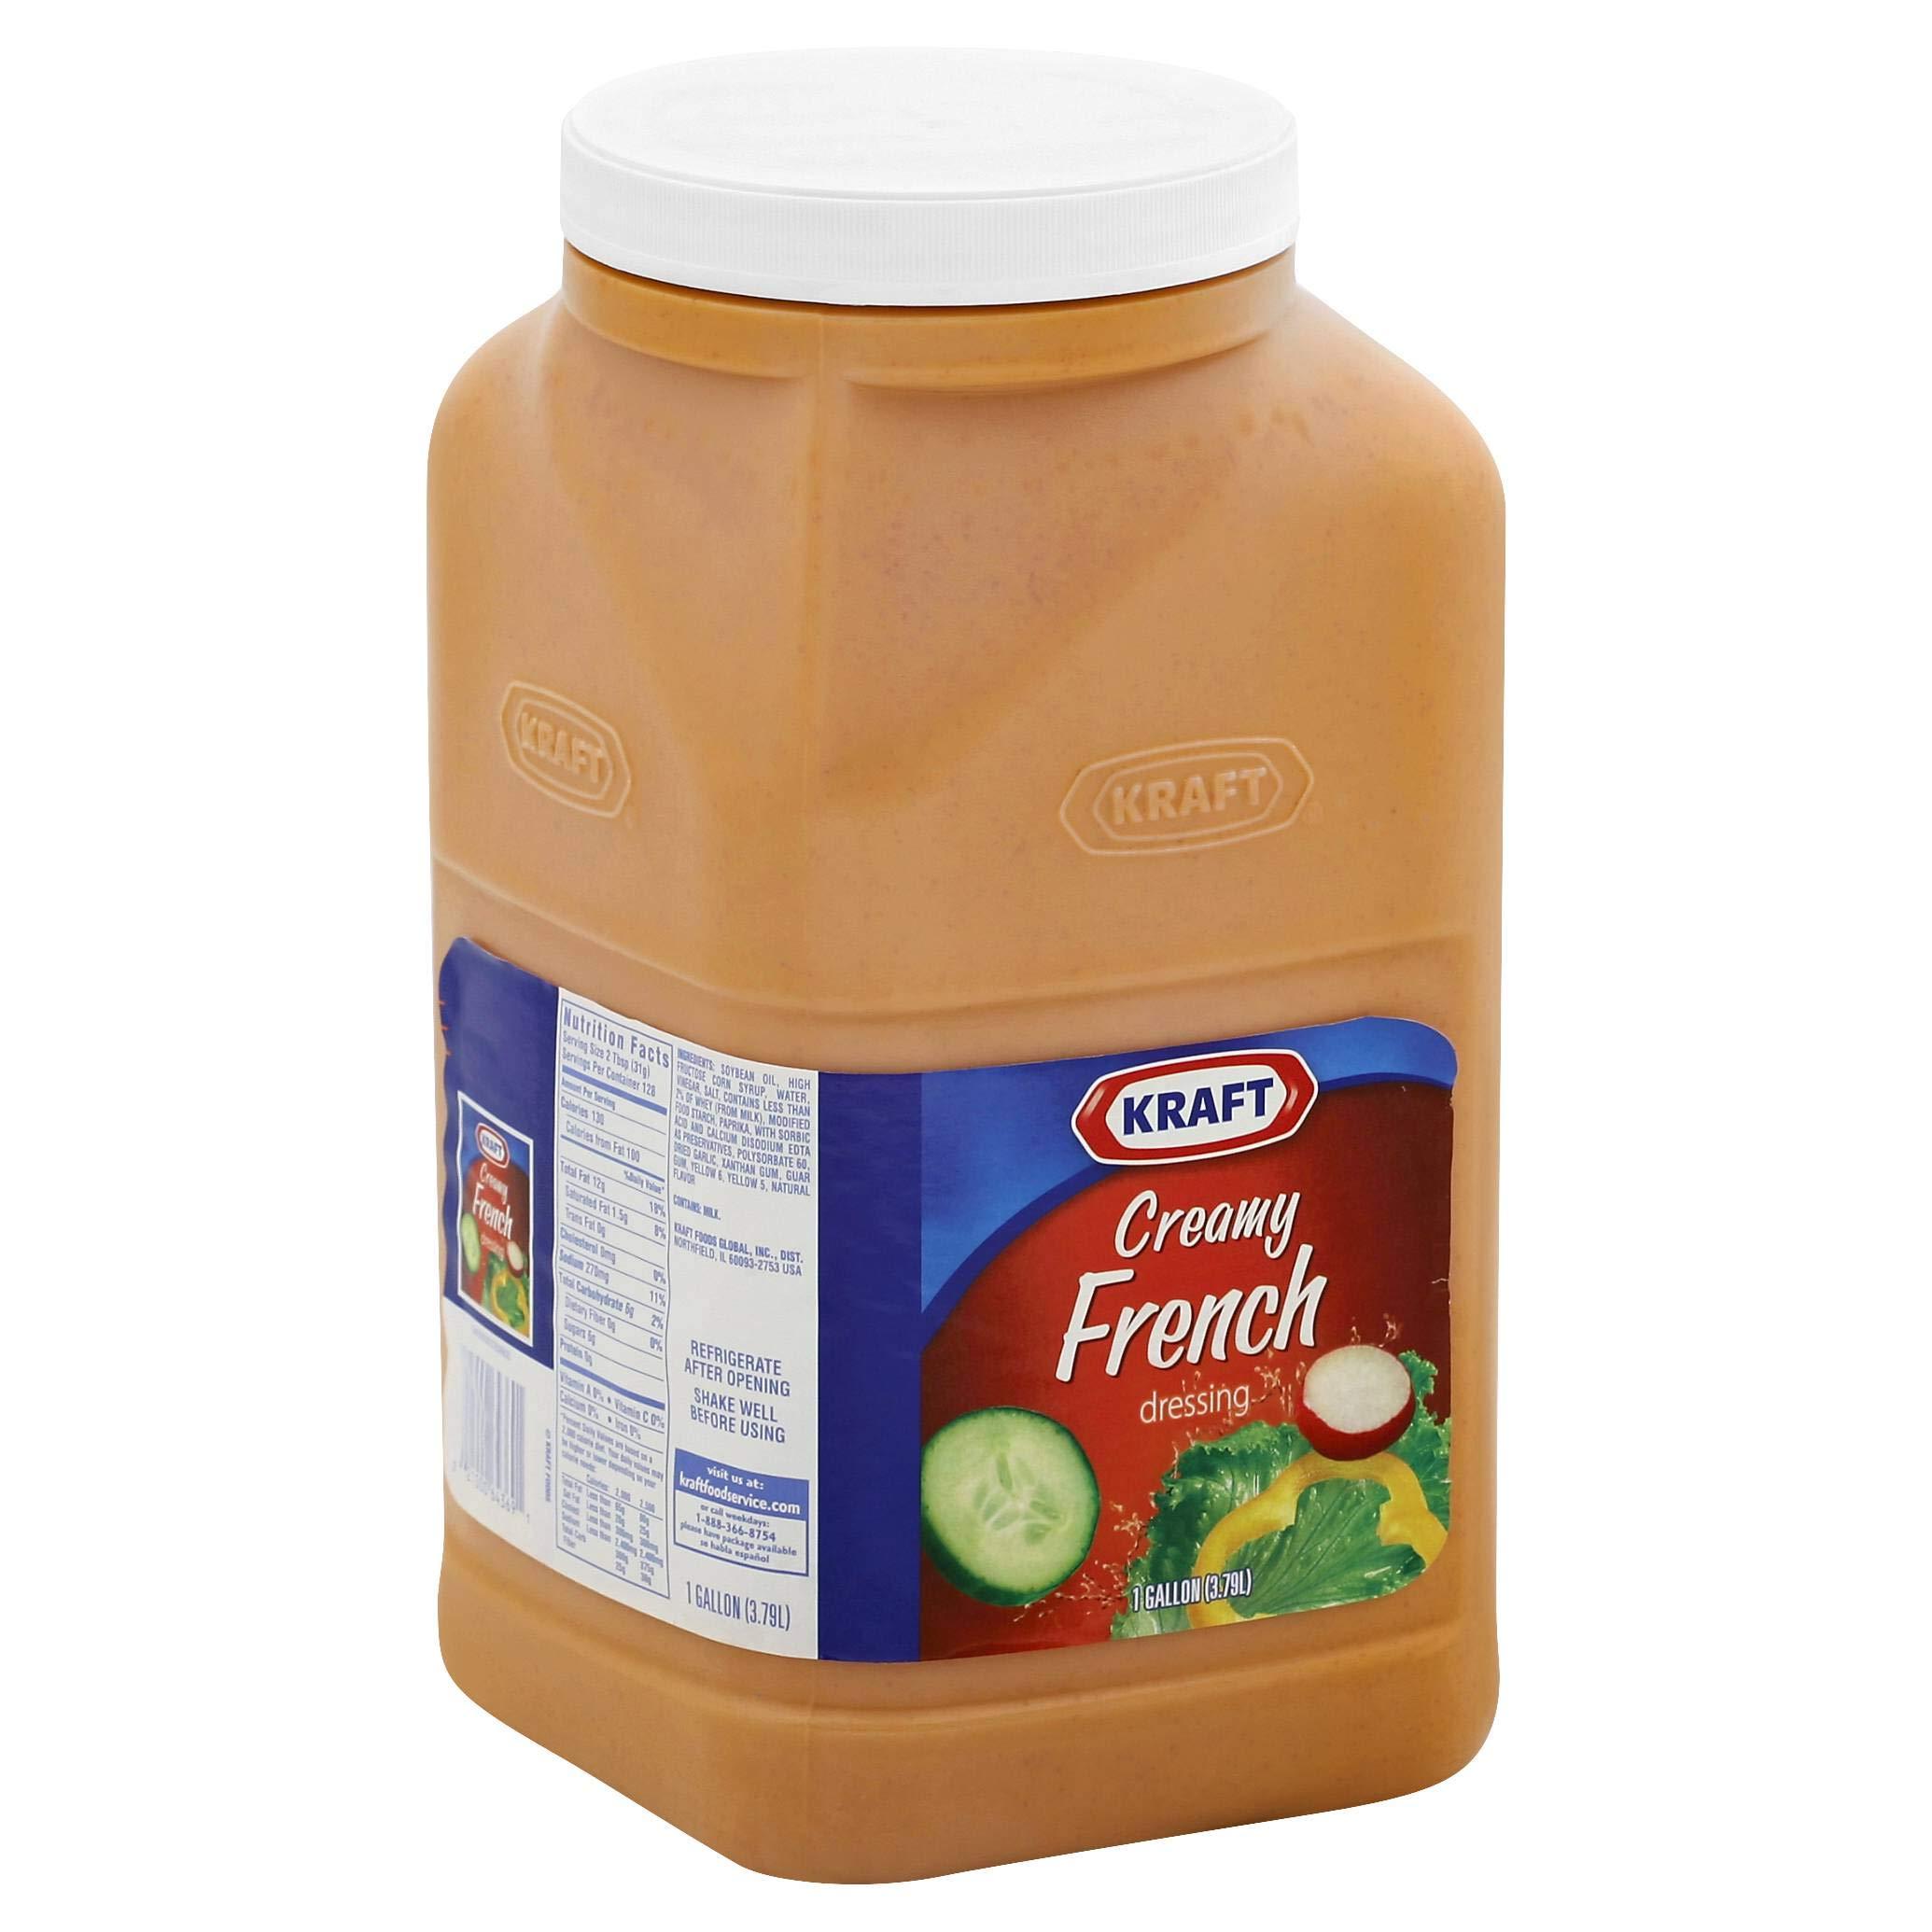 Dressing Creamy French 4 Case 1 Gallon